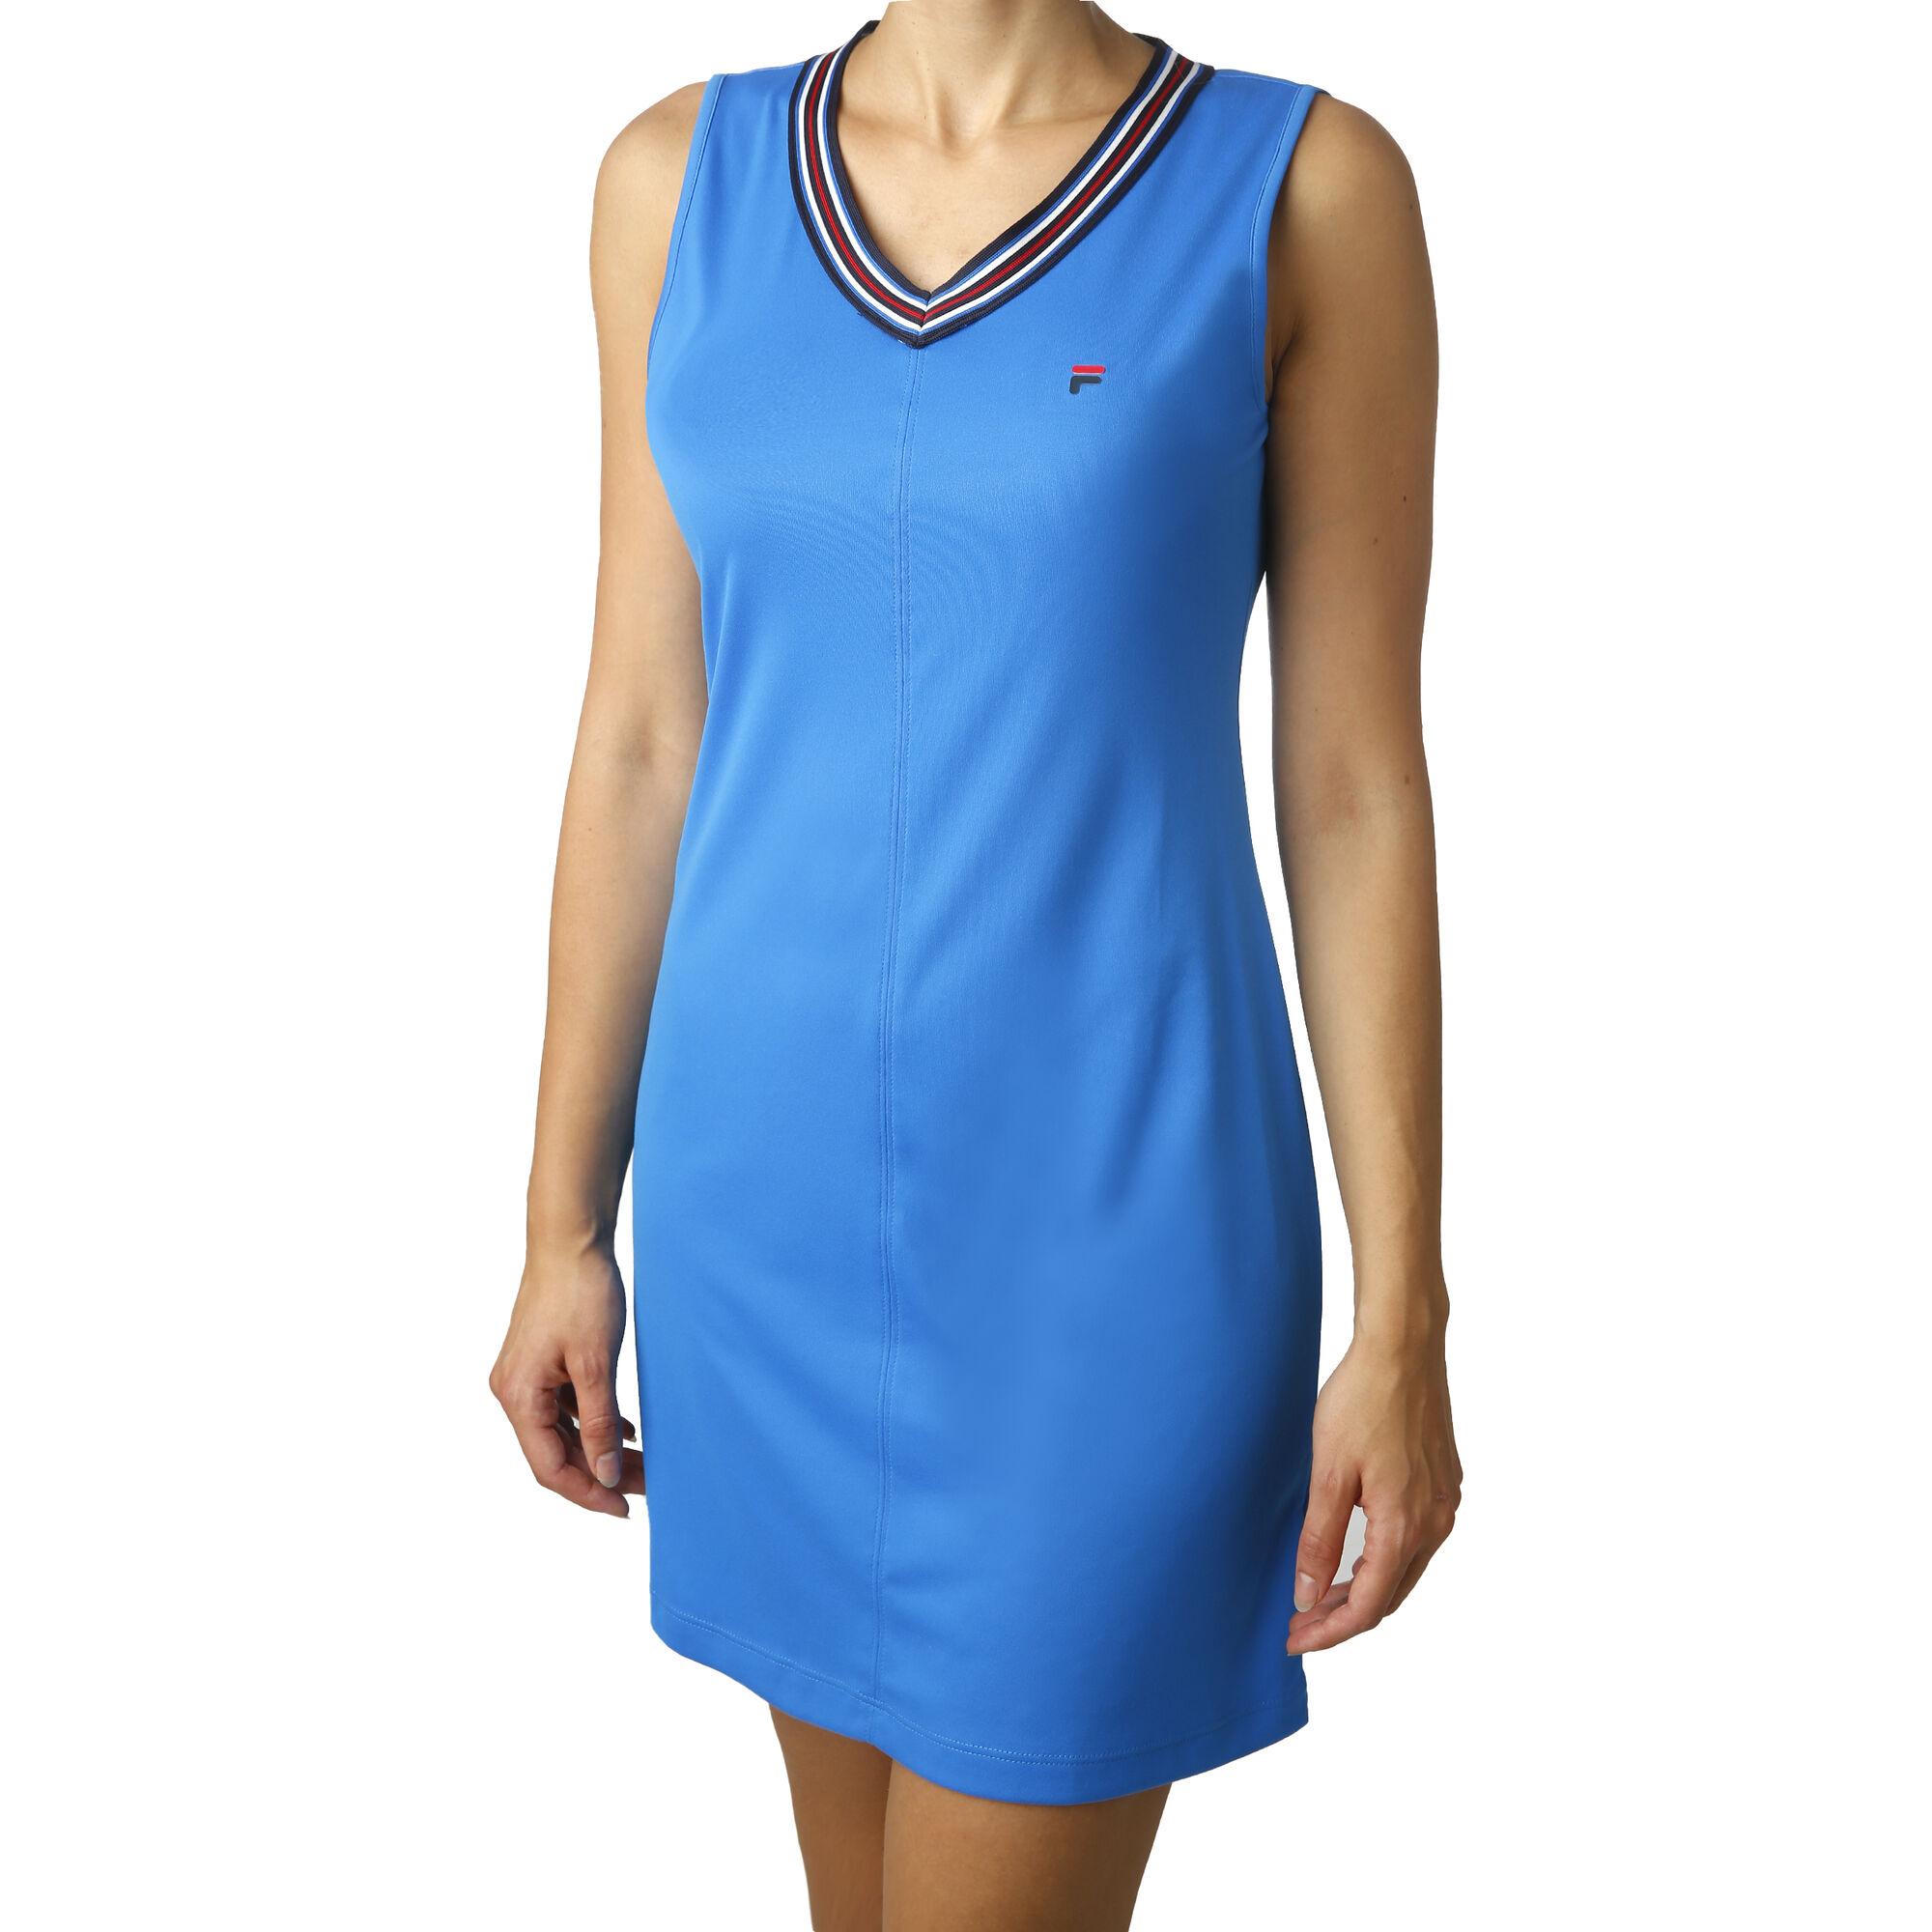 Fila Fancy Kleid Damen - Hellblau, Weiß online kaufen ...